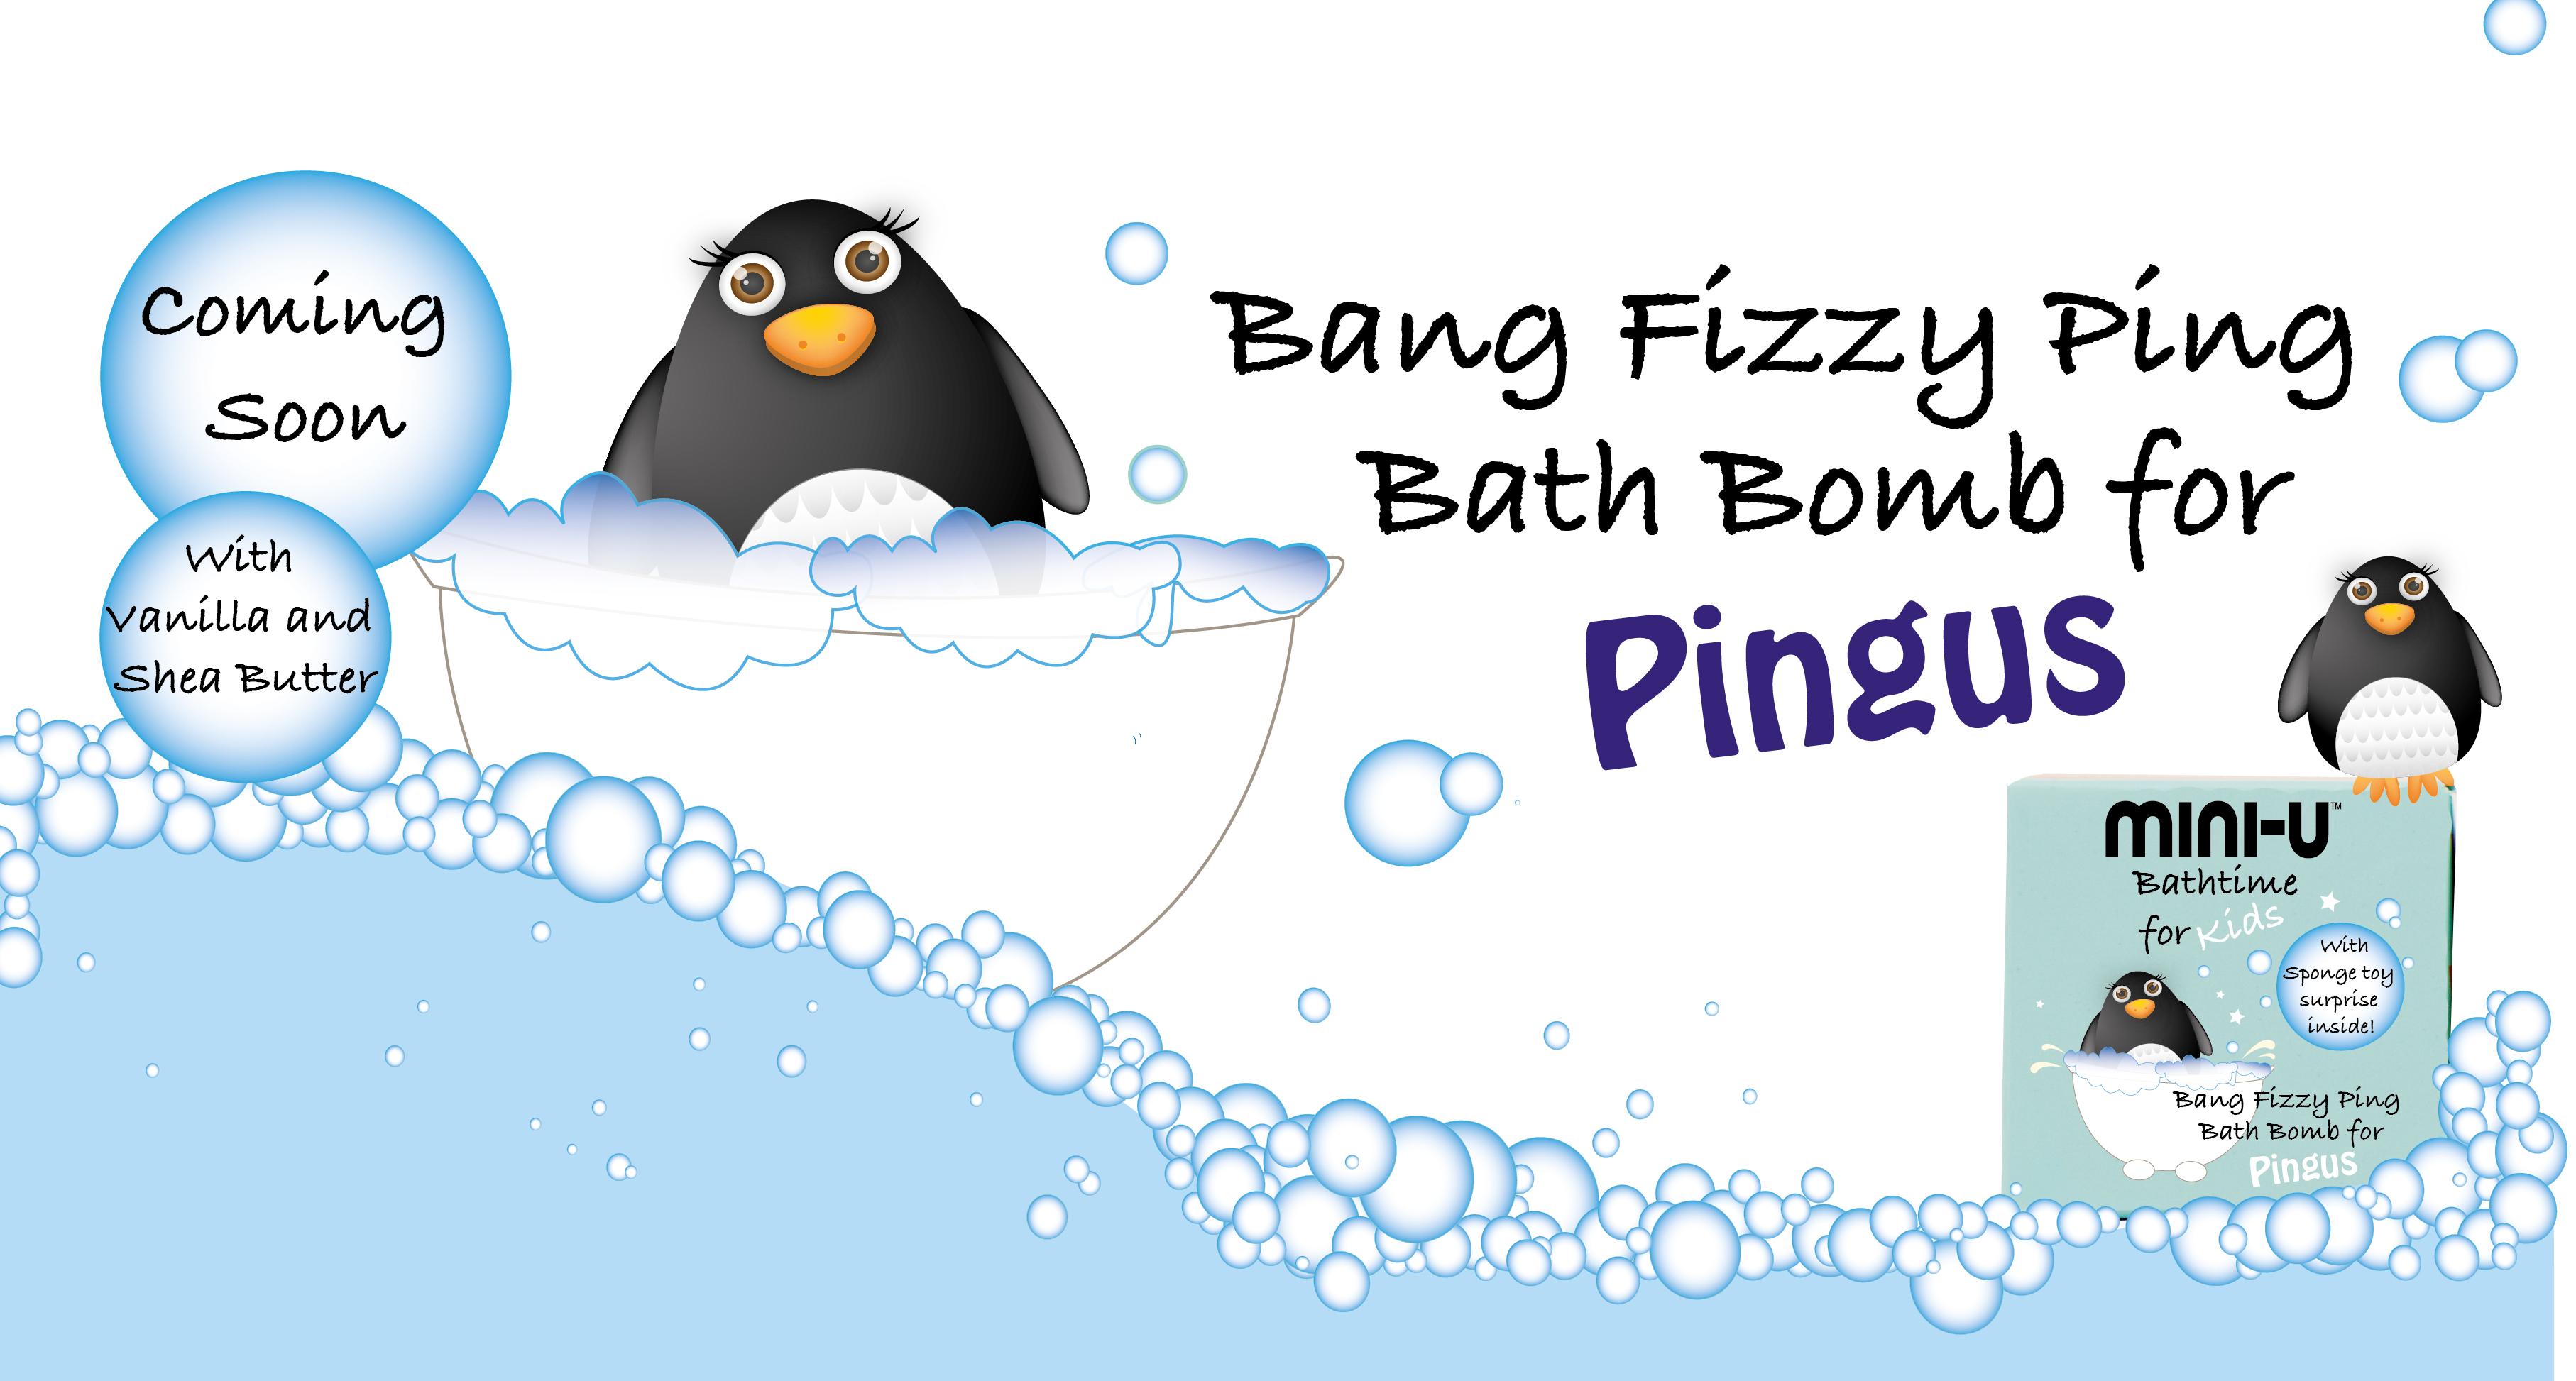 Single bath bomb coming soon social-01